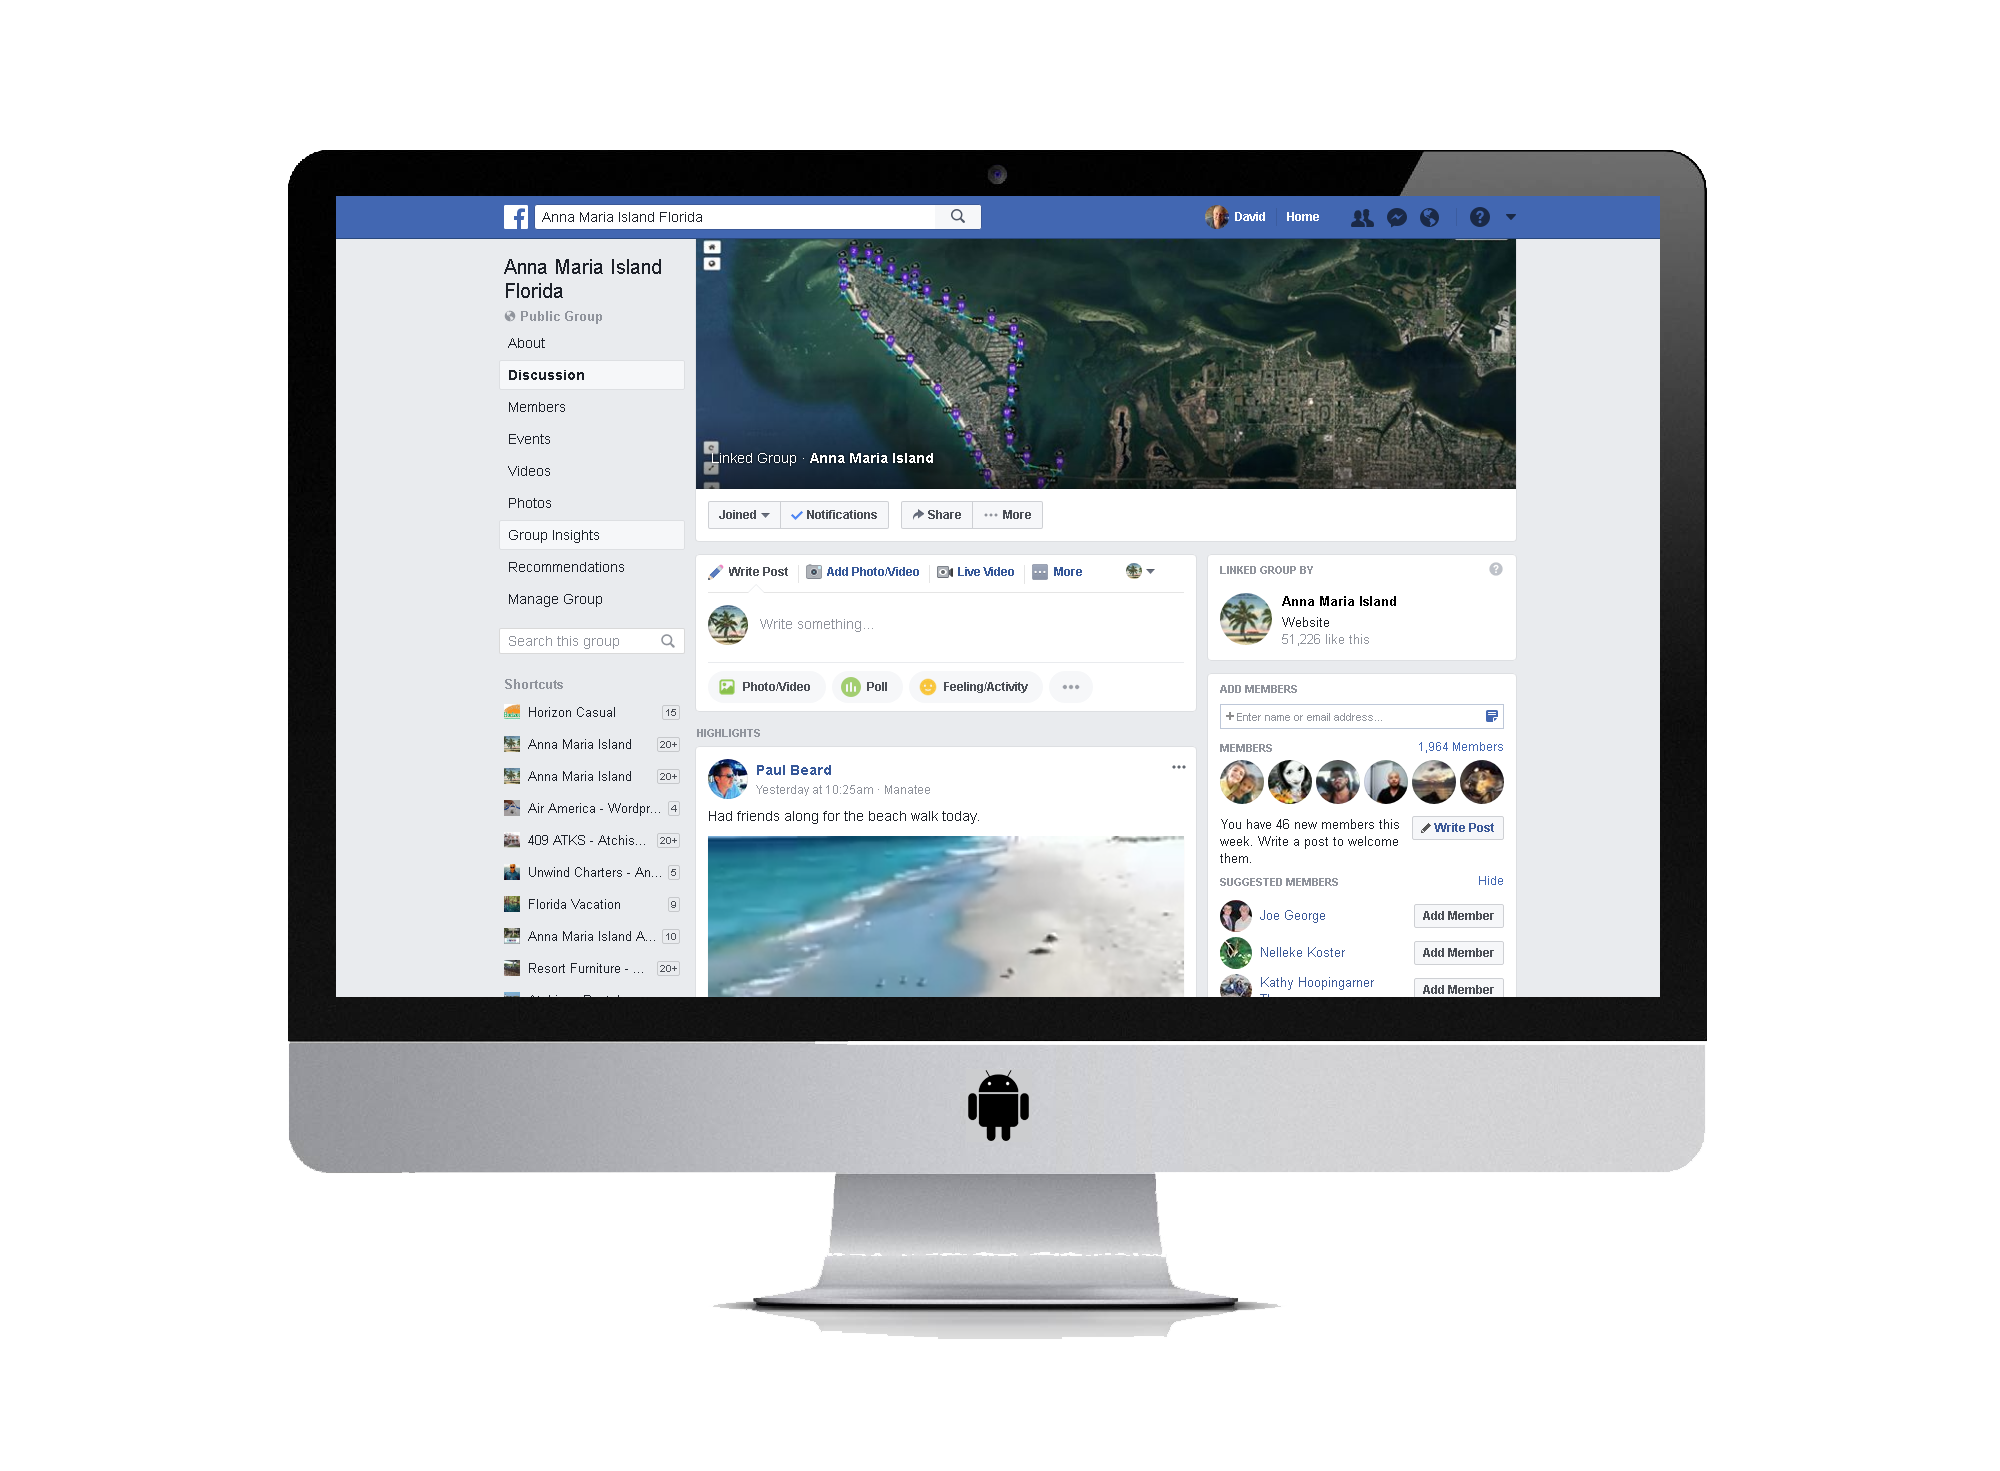 Anna Maria Island Facebook